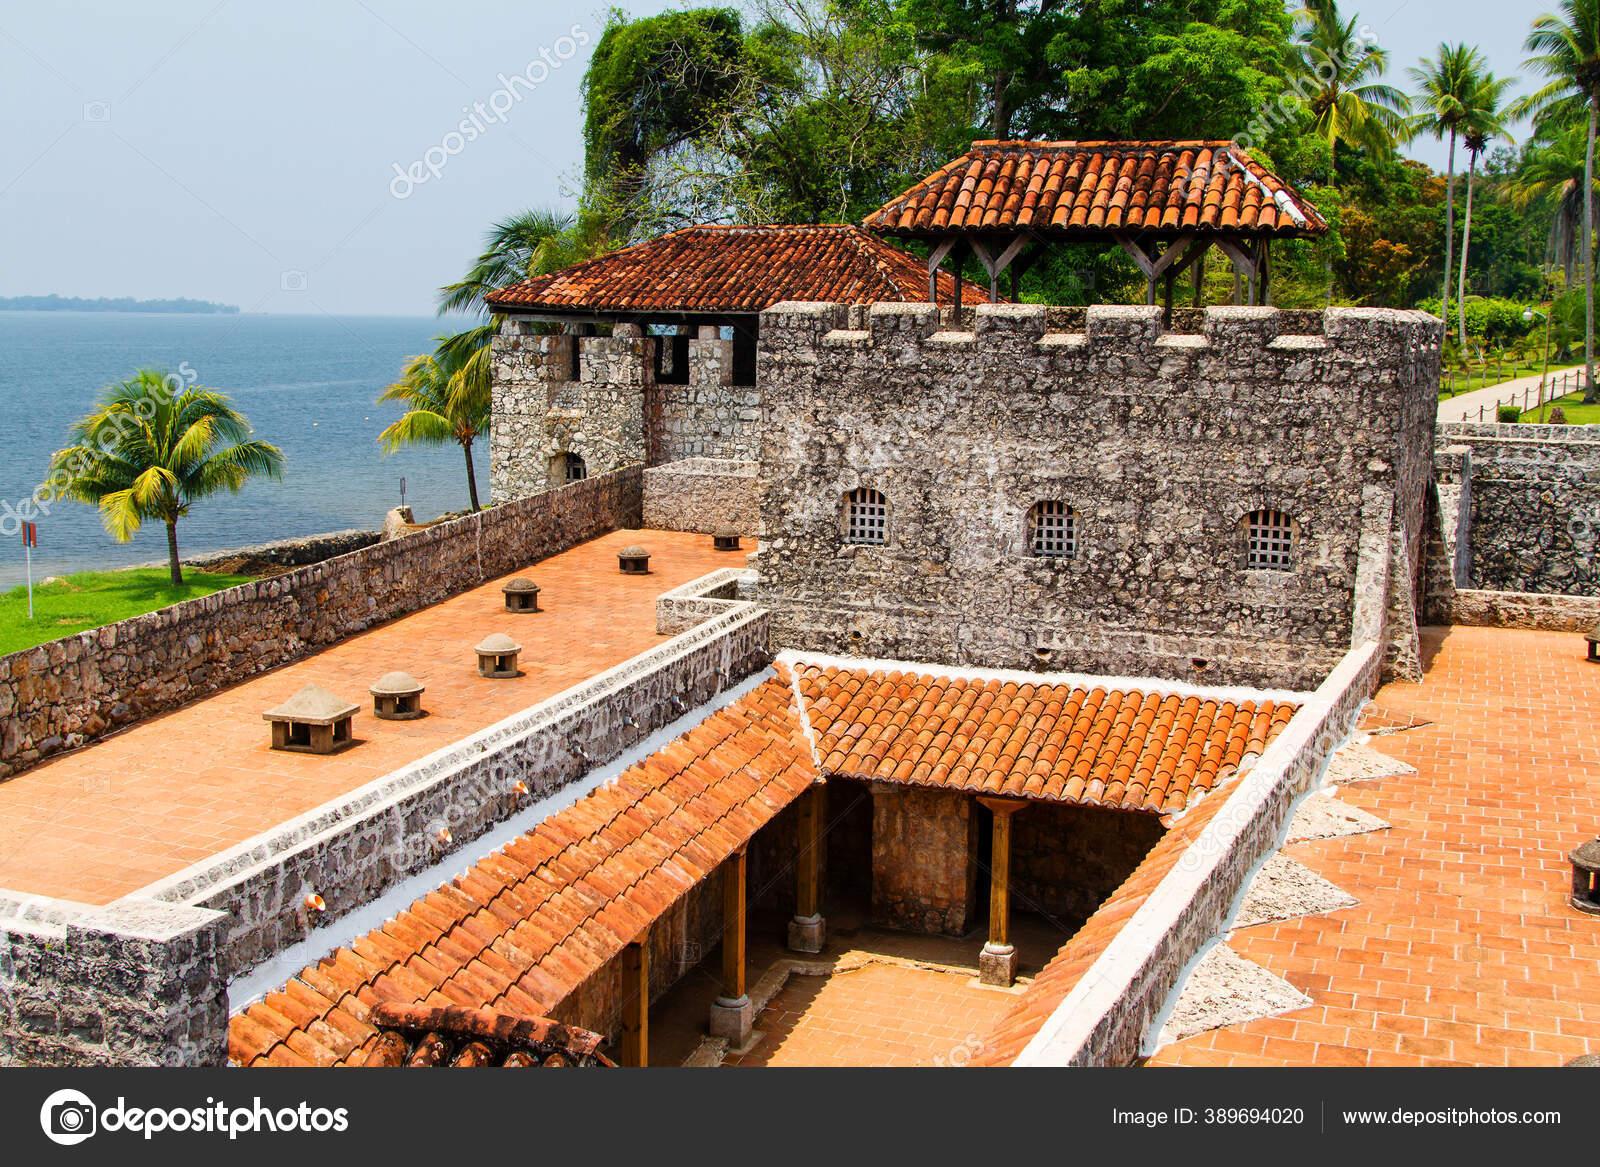 Dio Dulce Guatemala April Castillo San Felipe Lara Rio Dulce Stok Foto C Kefirm 389694020